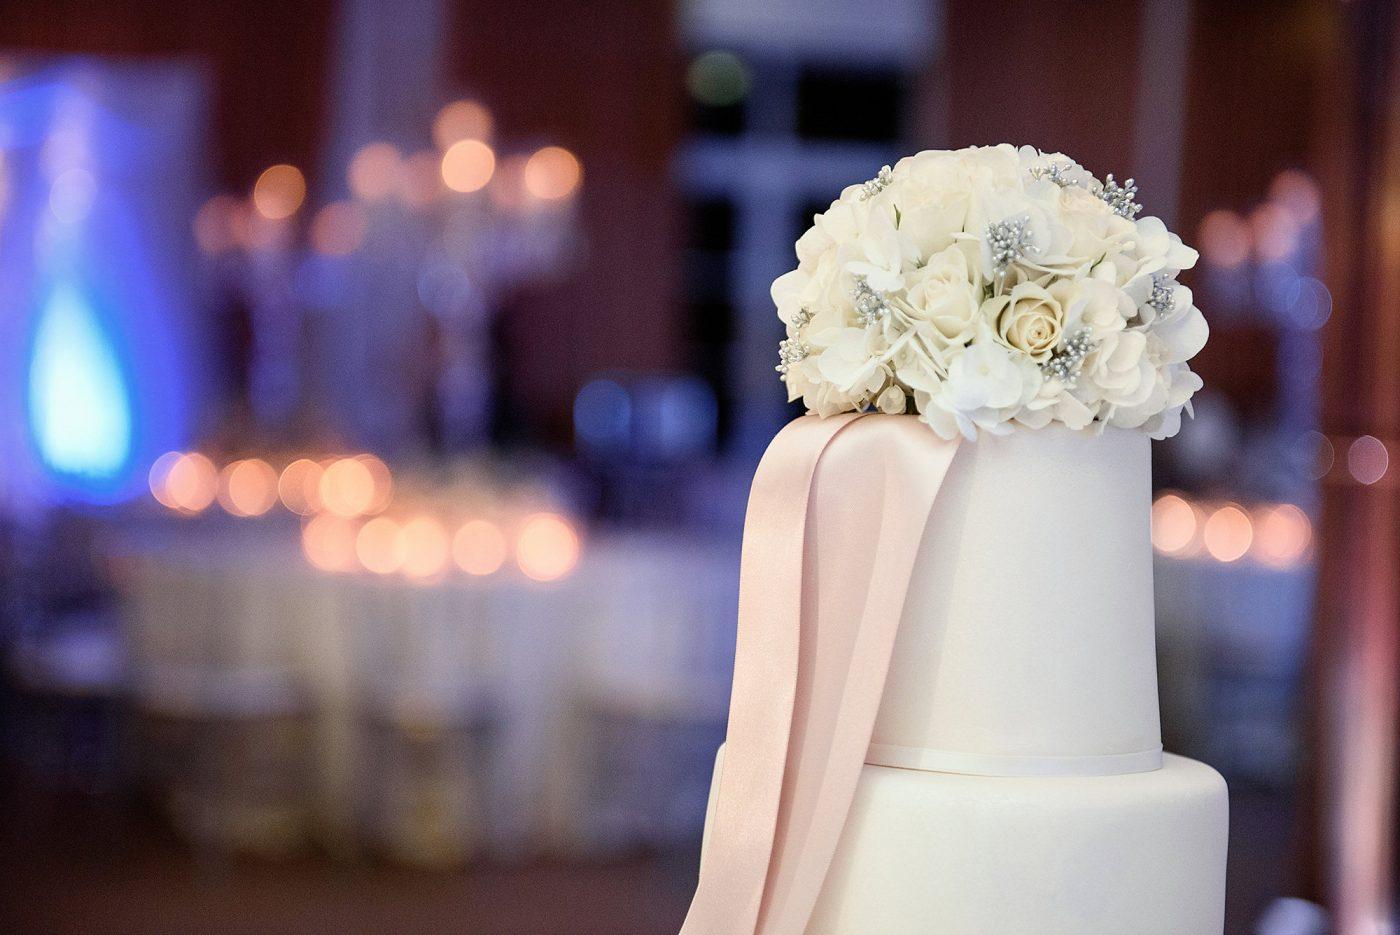 wedding cake at winter elopement